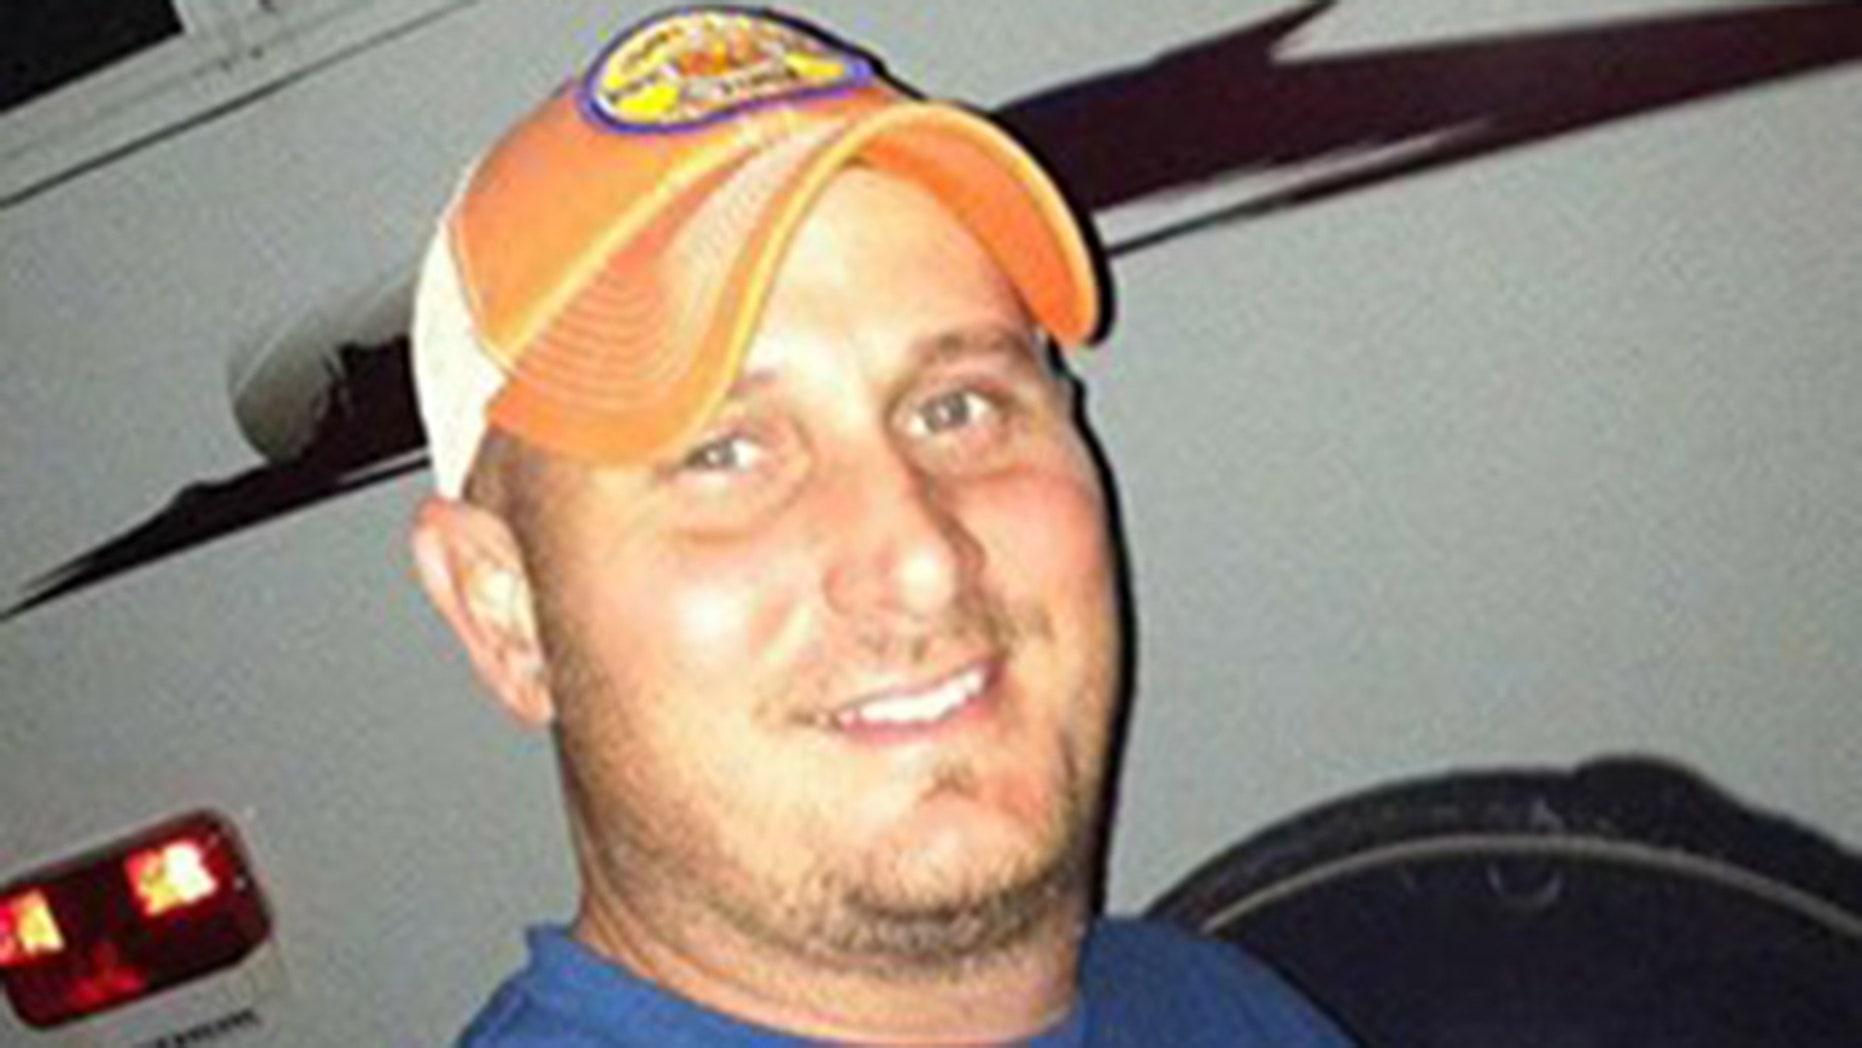 David Oakley vanished since June 1.